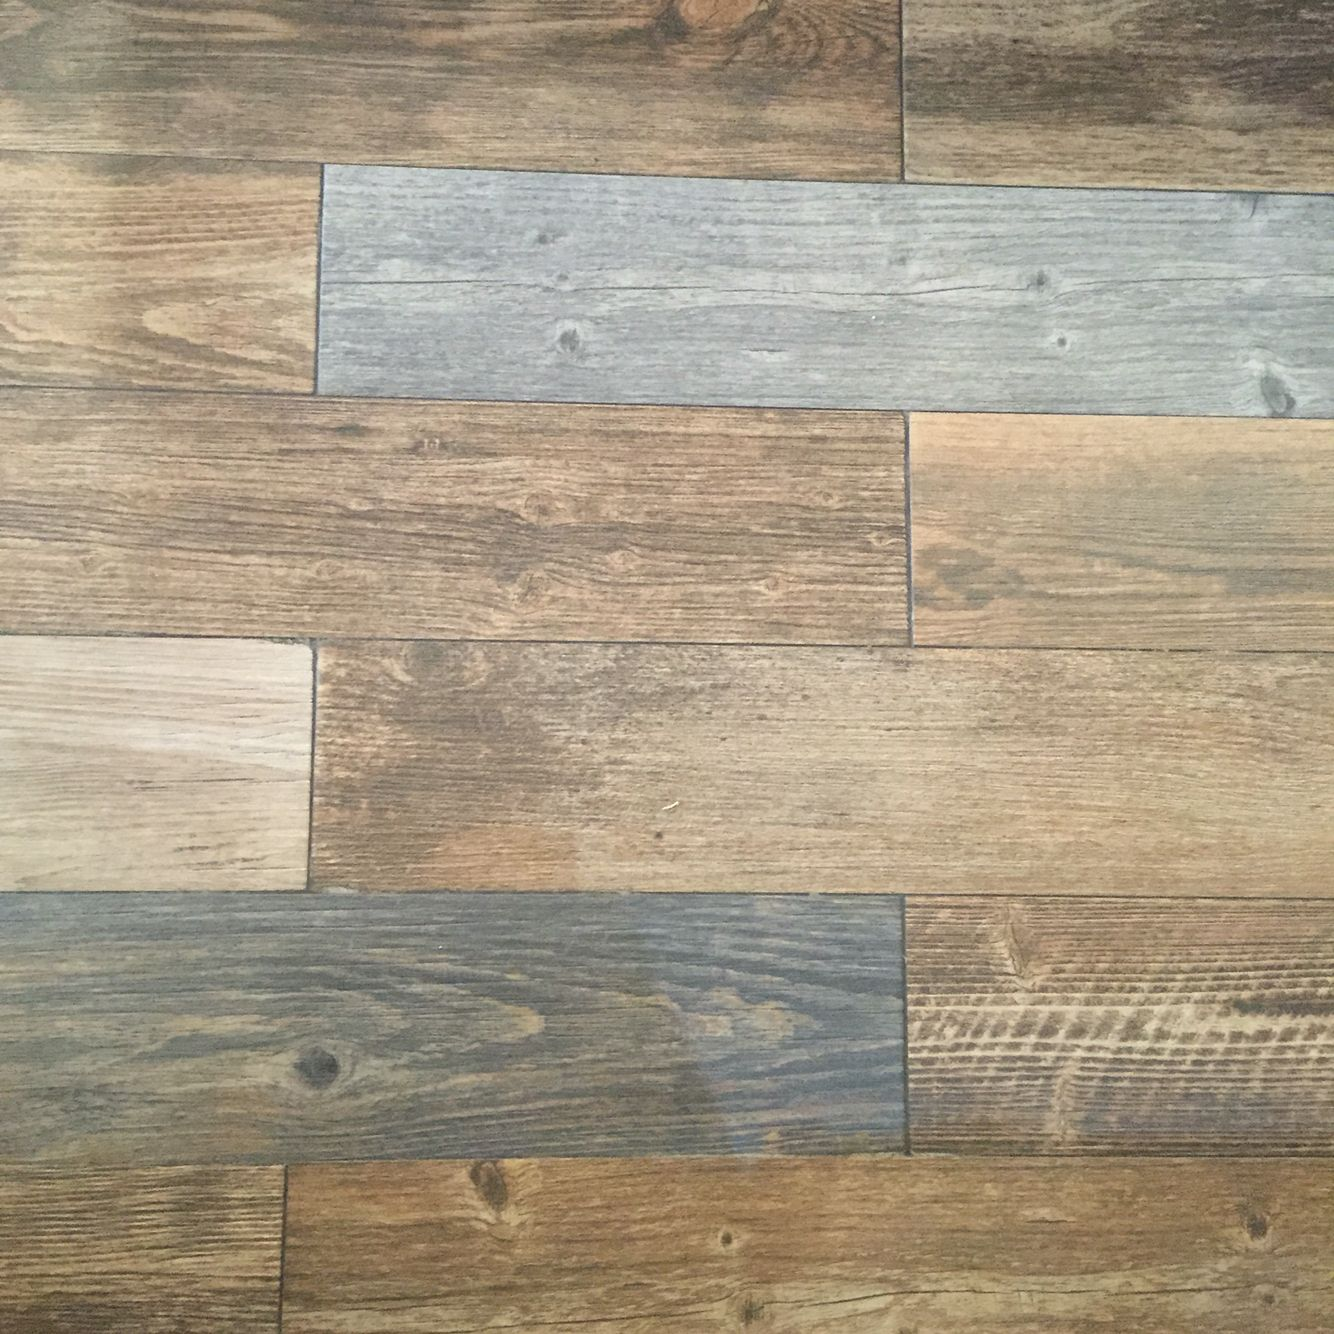 Piso de cer mica imitaci n madera textures in 2019 - Imitacion madera para fachadas ...